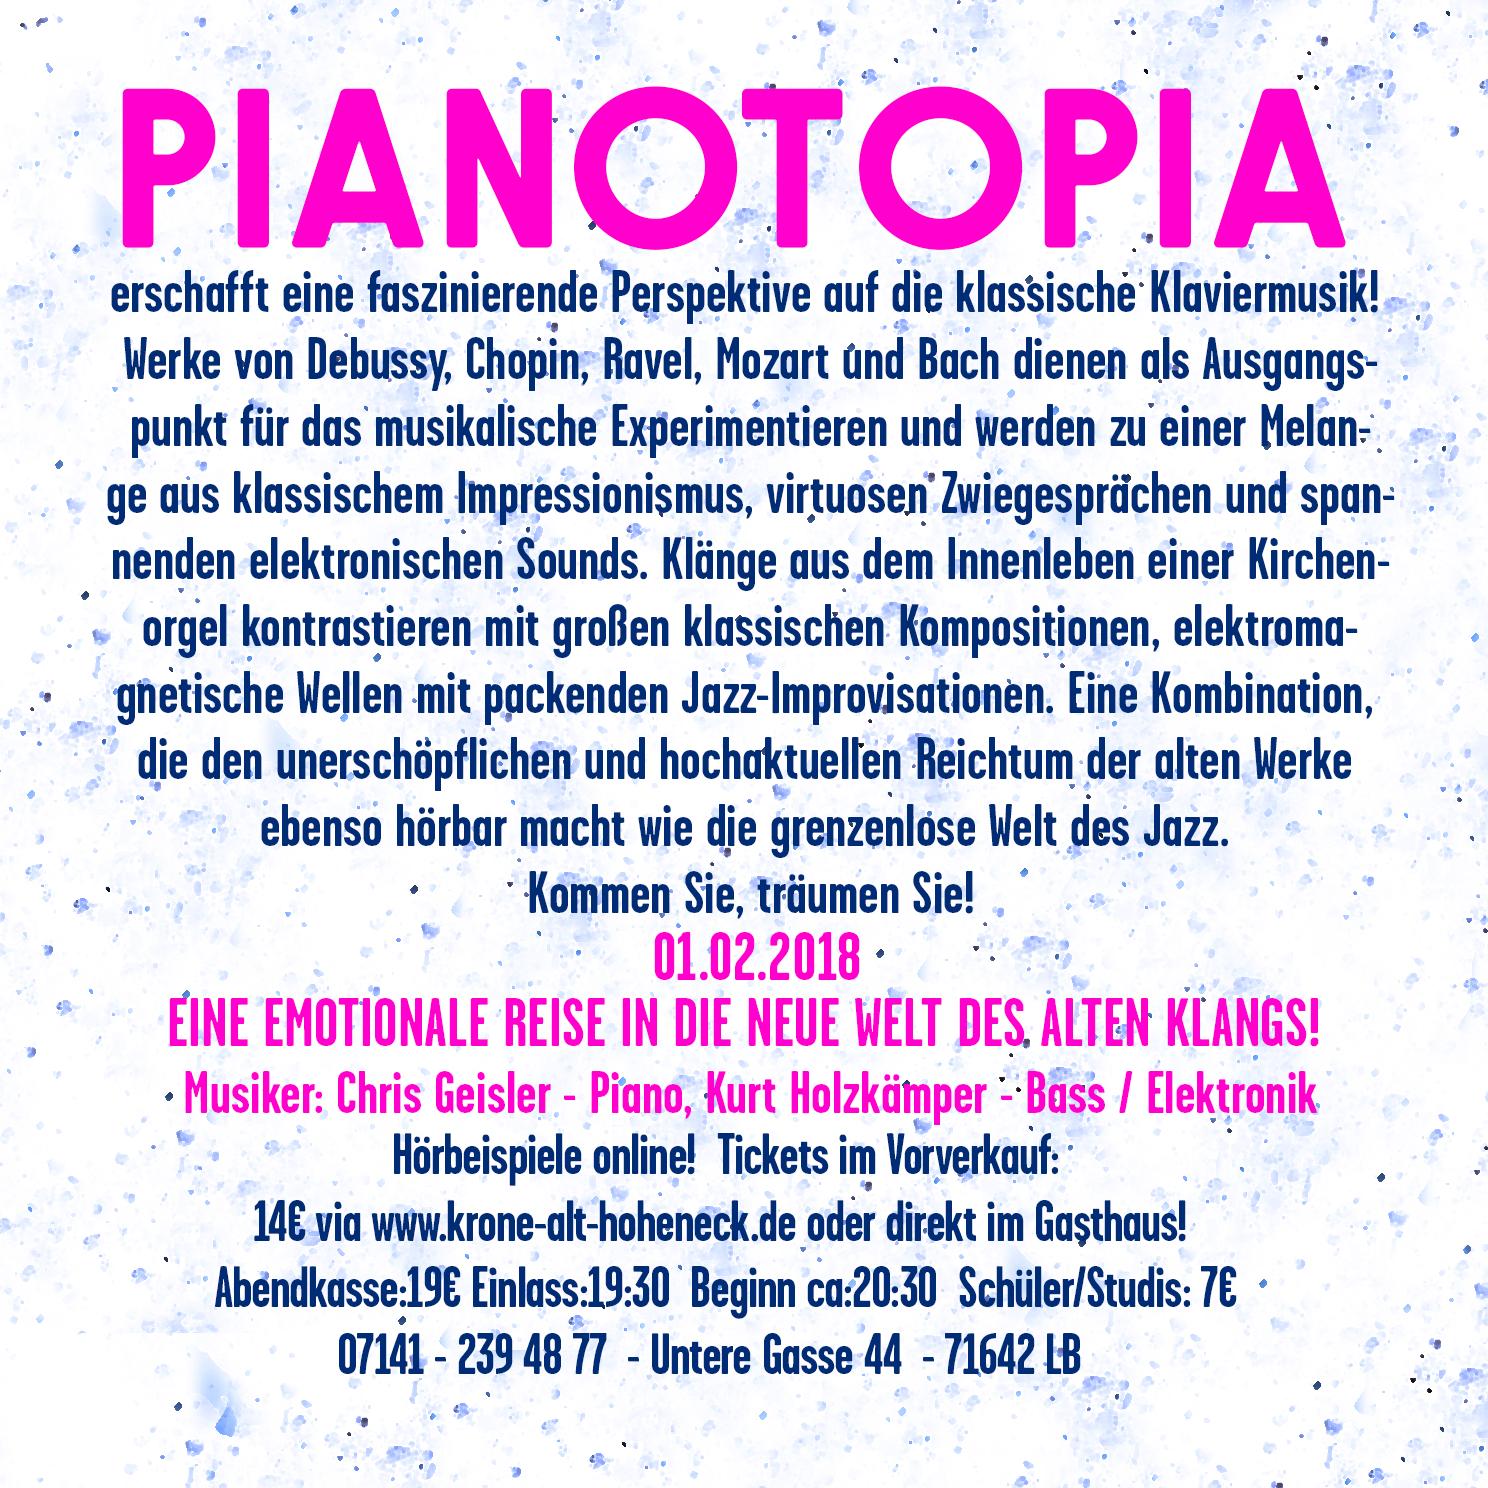 Pianotopia_RS.jpeg